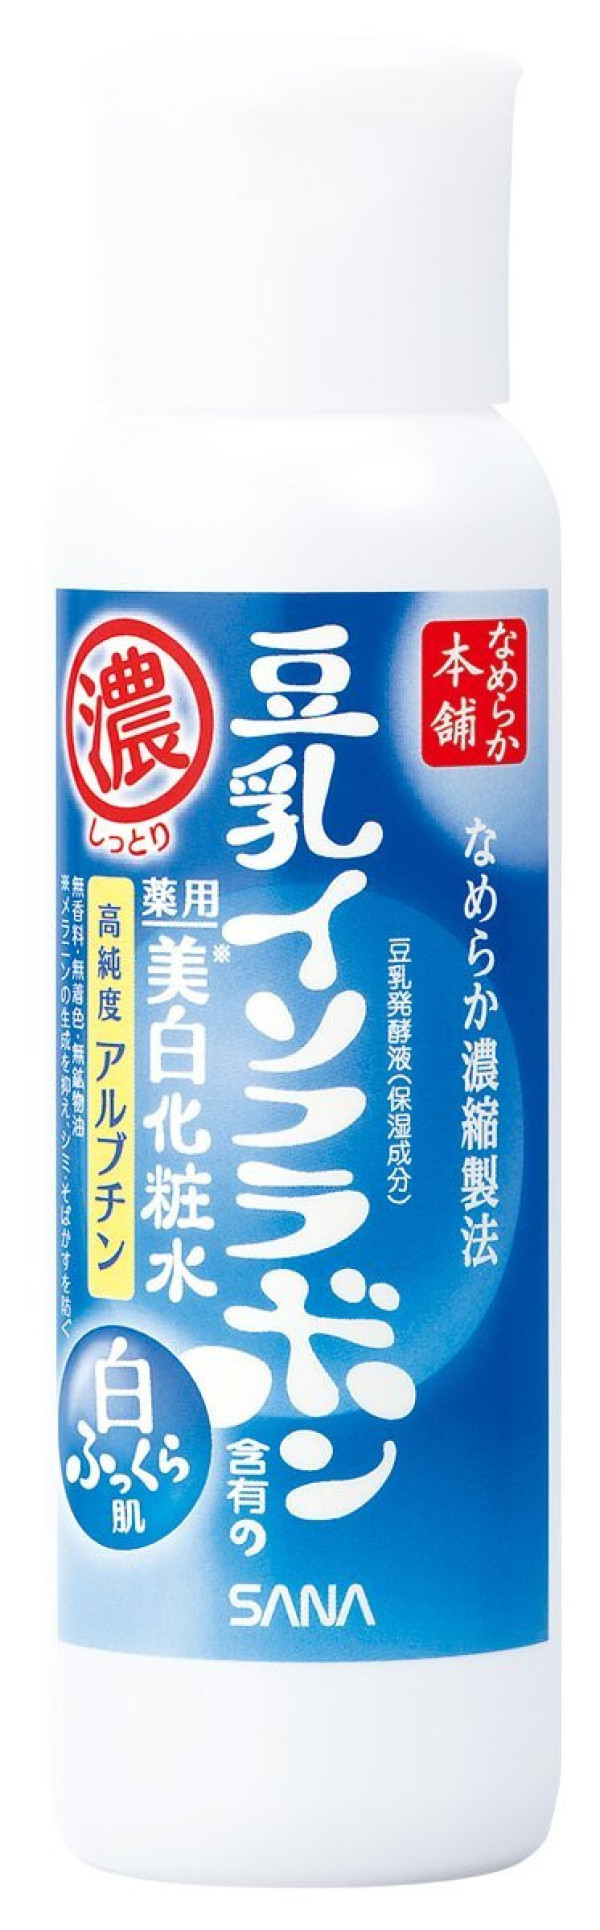 Отбеливающий лосьон Sana Nameraka Honpo Whitening Moisturizing Lotion